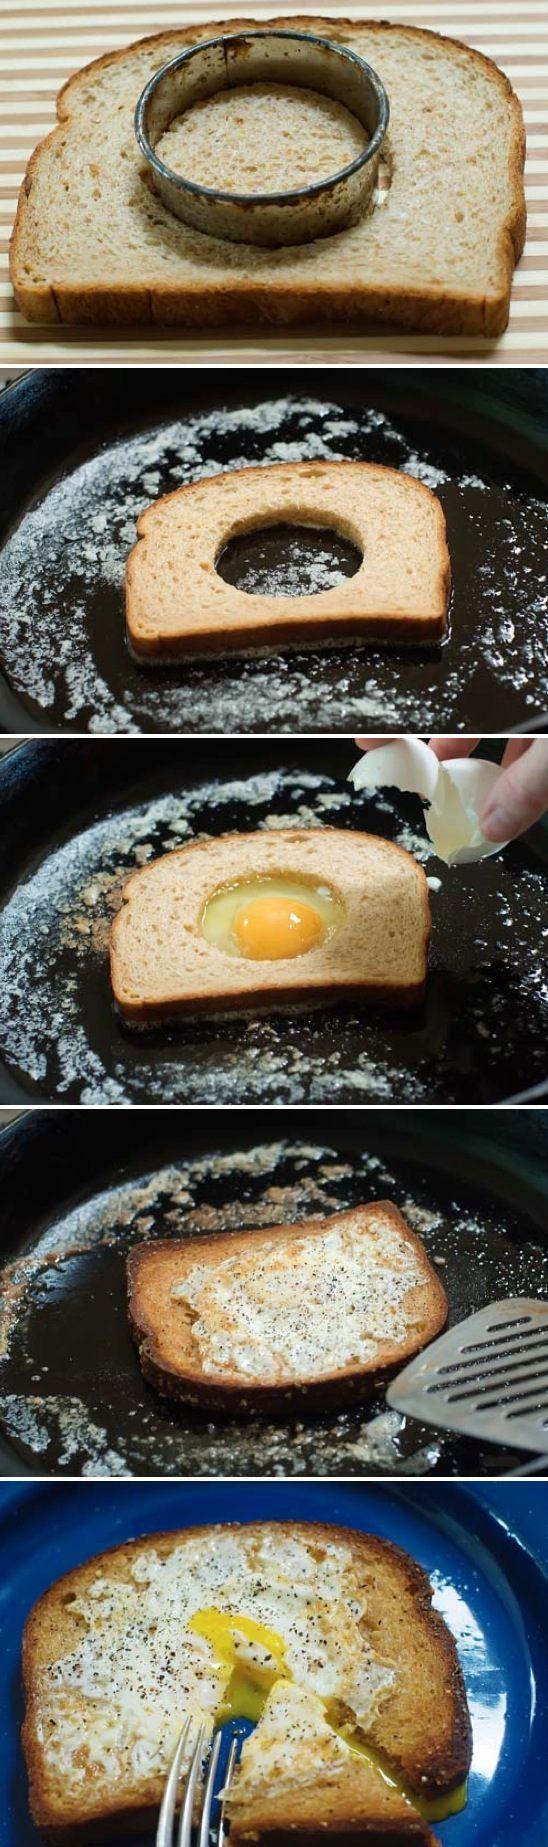 Top 10 Easy Breakfast Ideas Egg in a Hole